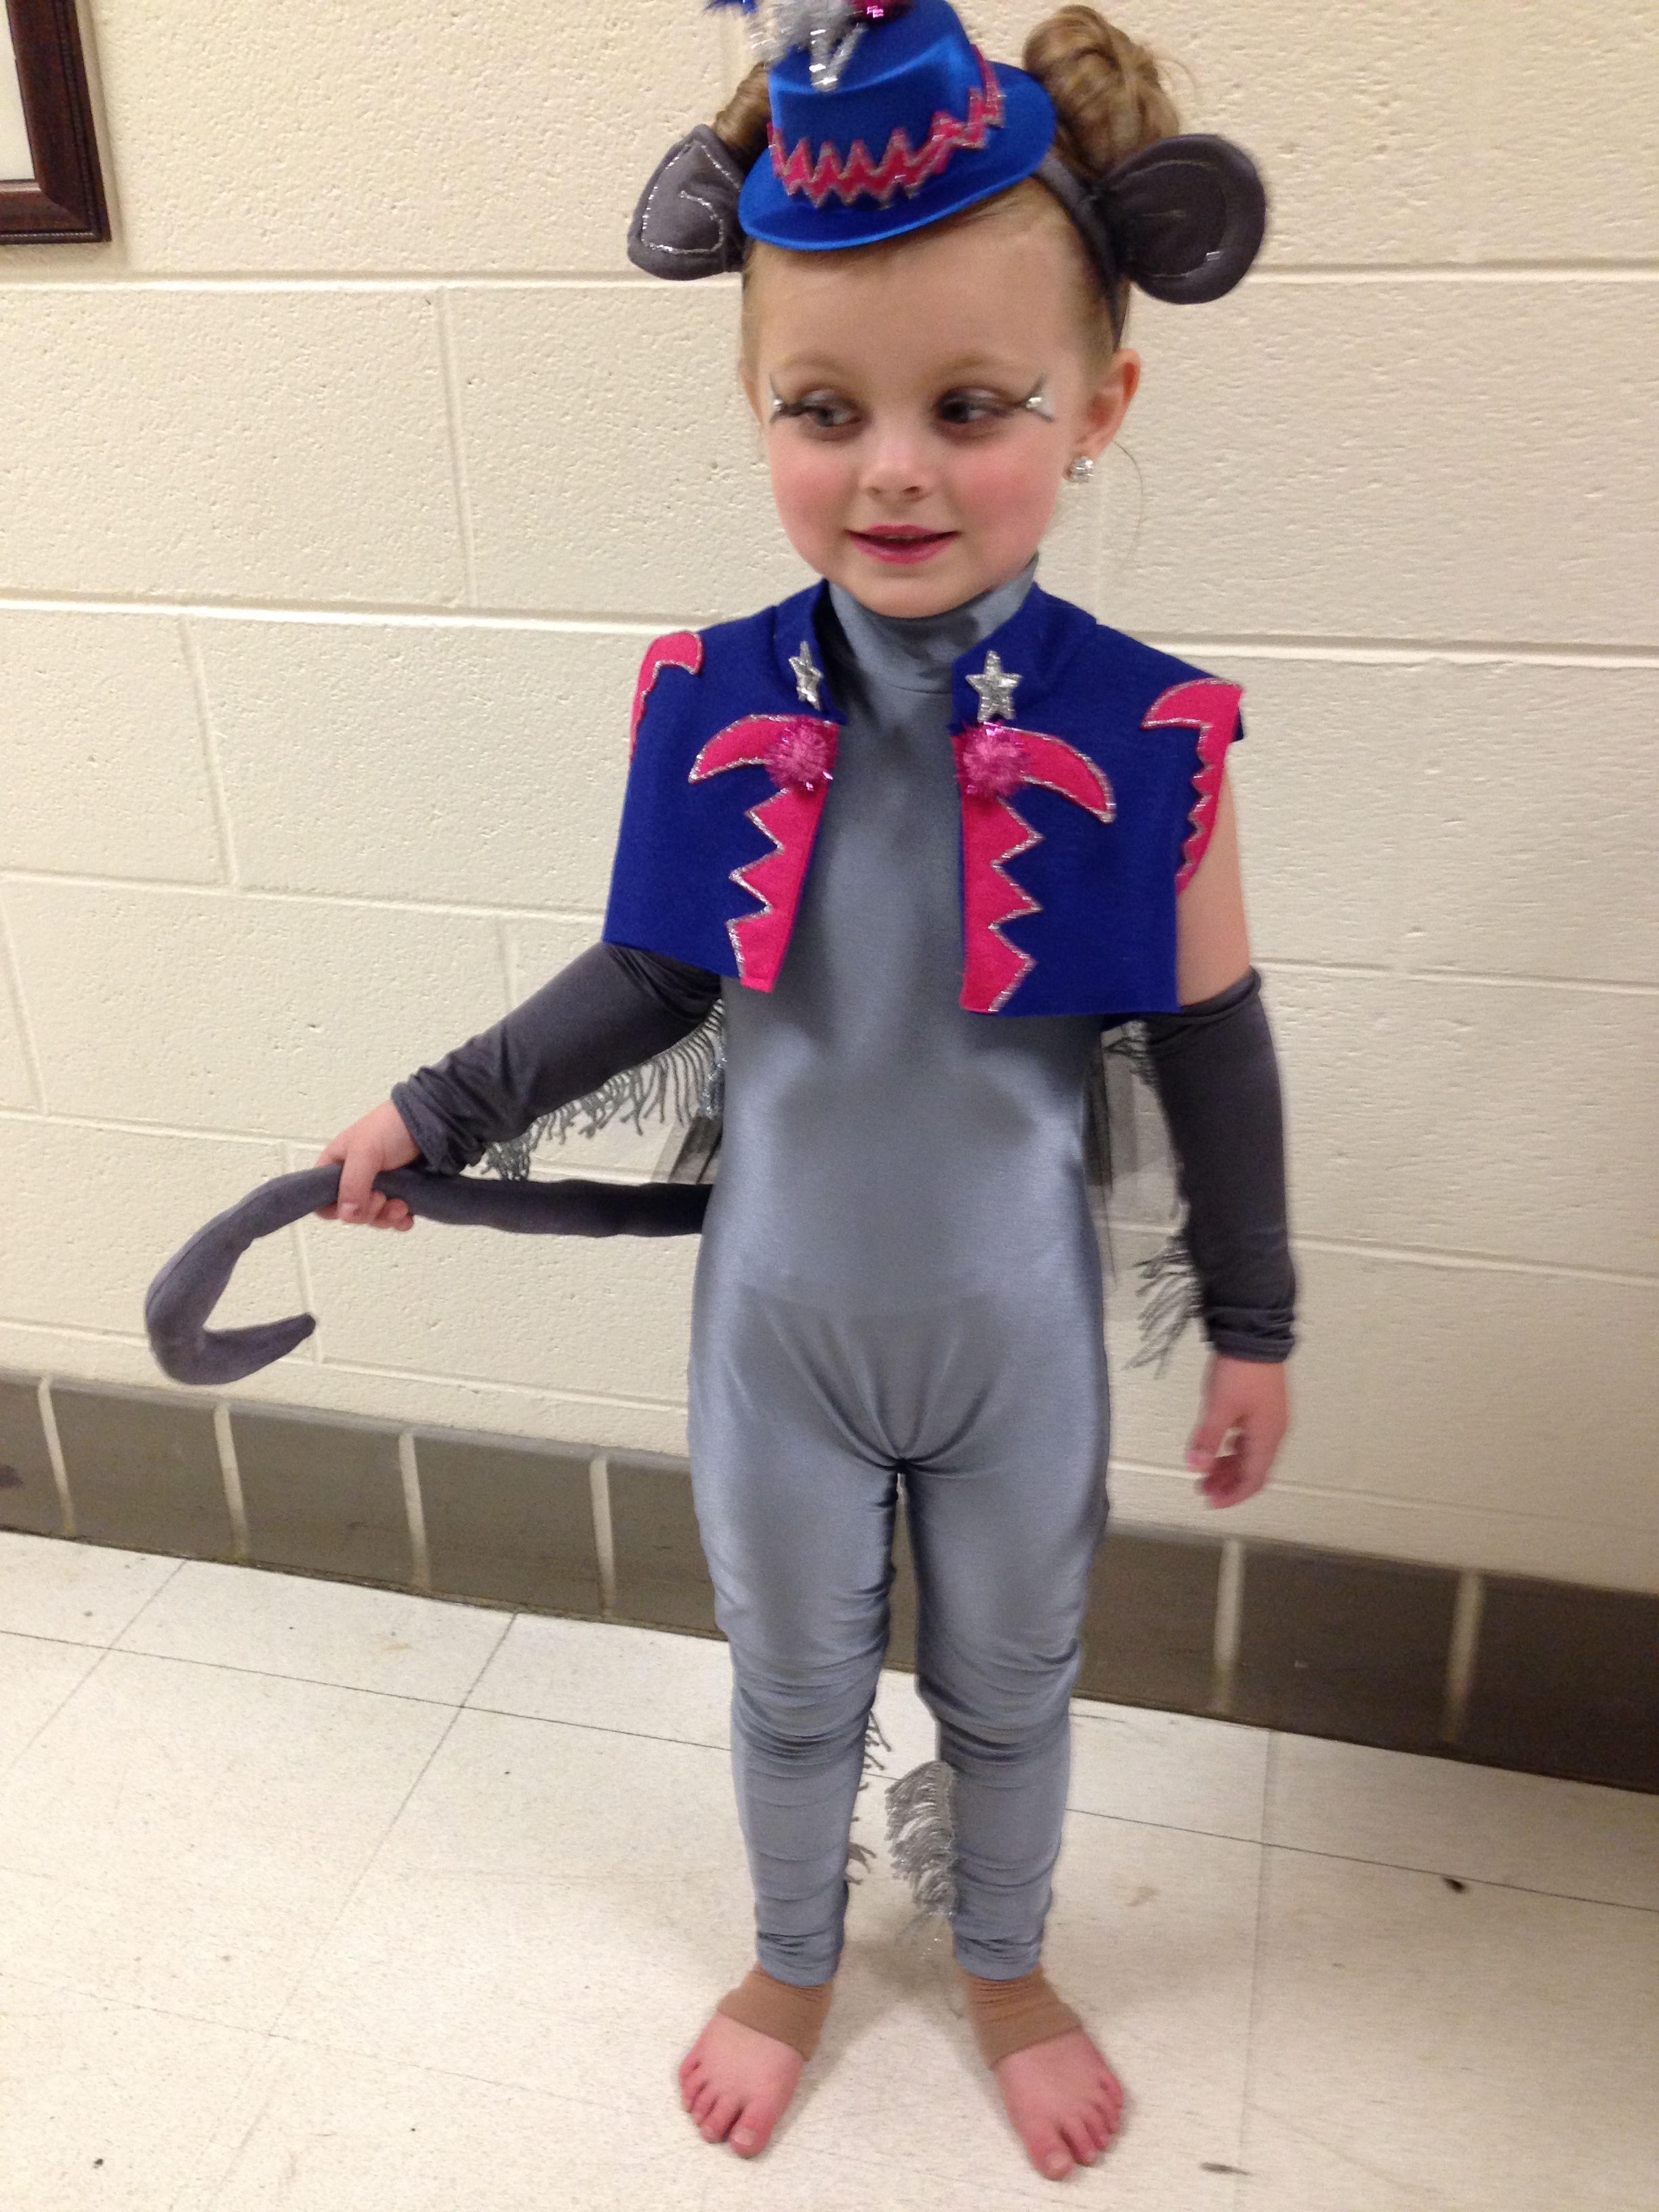 Flying monkey costume- Wizard of oz | costume stuff | Pinterest ...